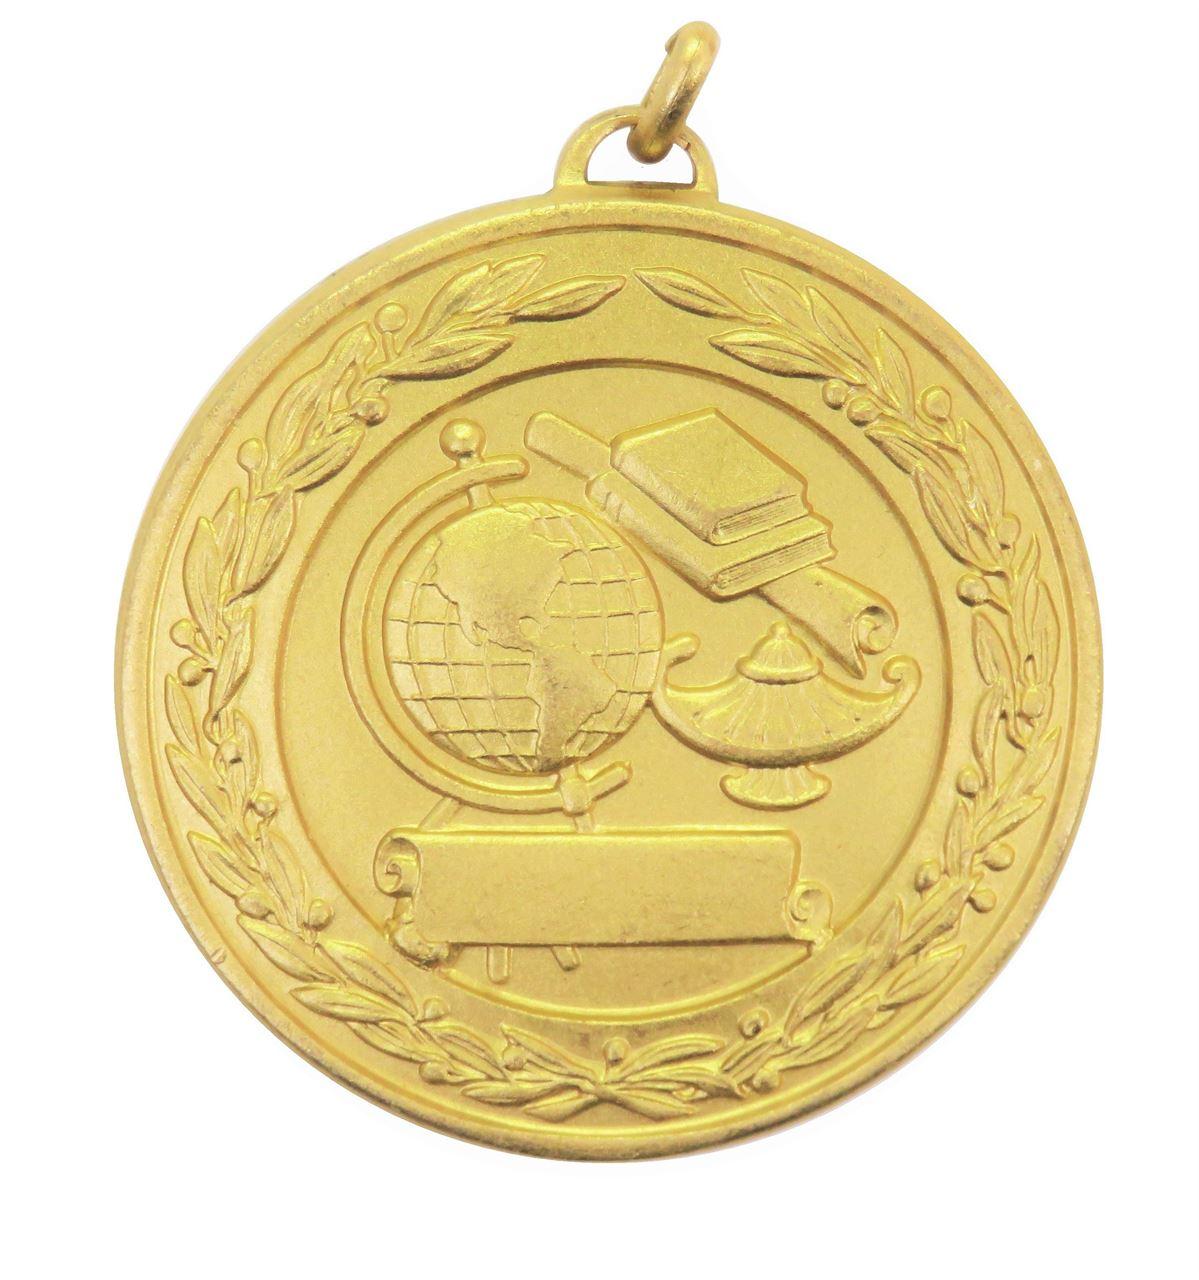 Gold Laurel Economy Academic Medal (size: 50mm) - 9599E